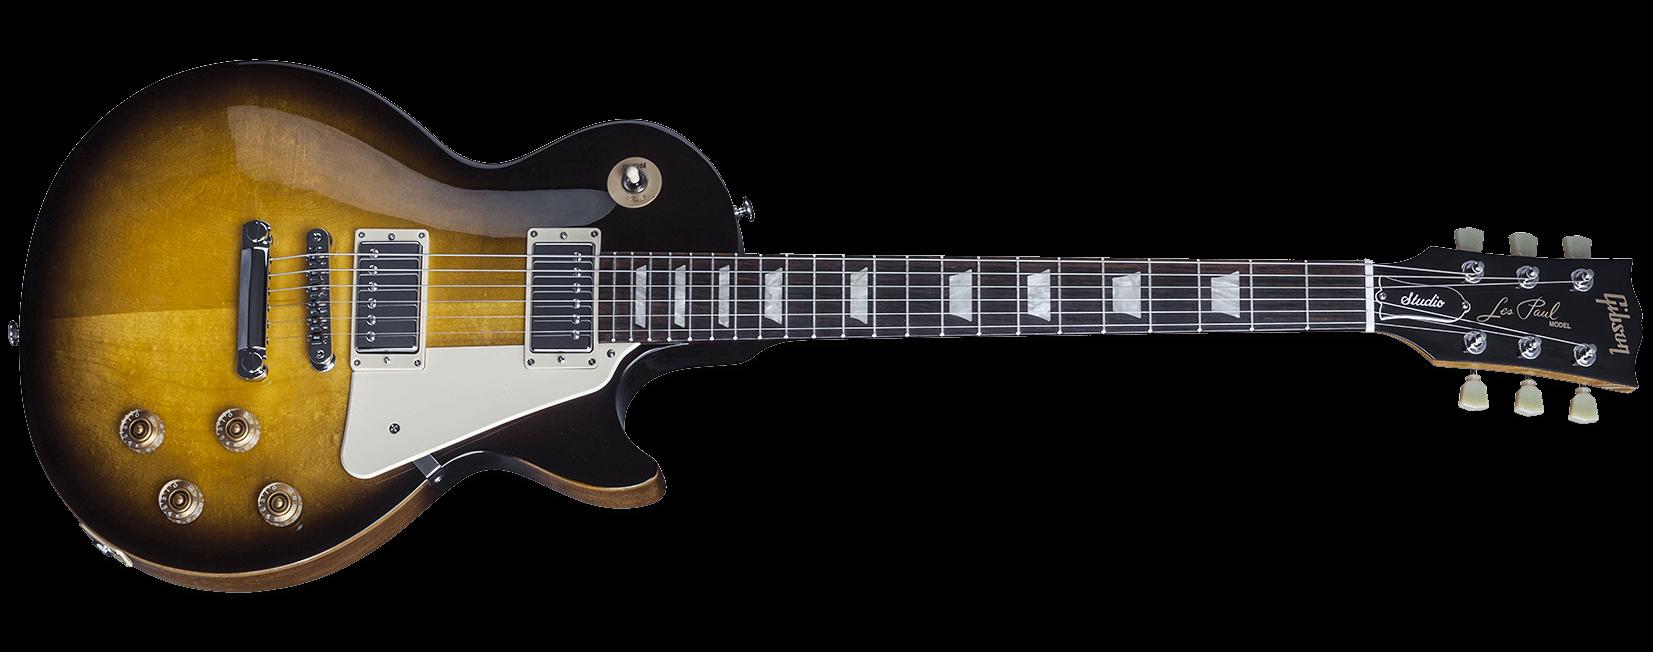 Gibson Les Paul Studio T 2016 Vintage Sunburst